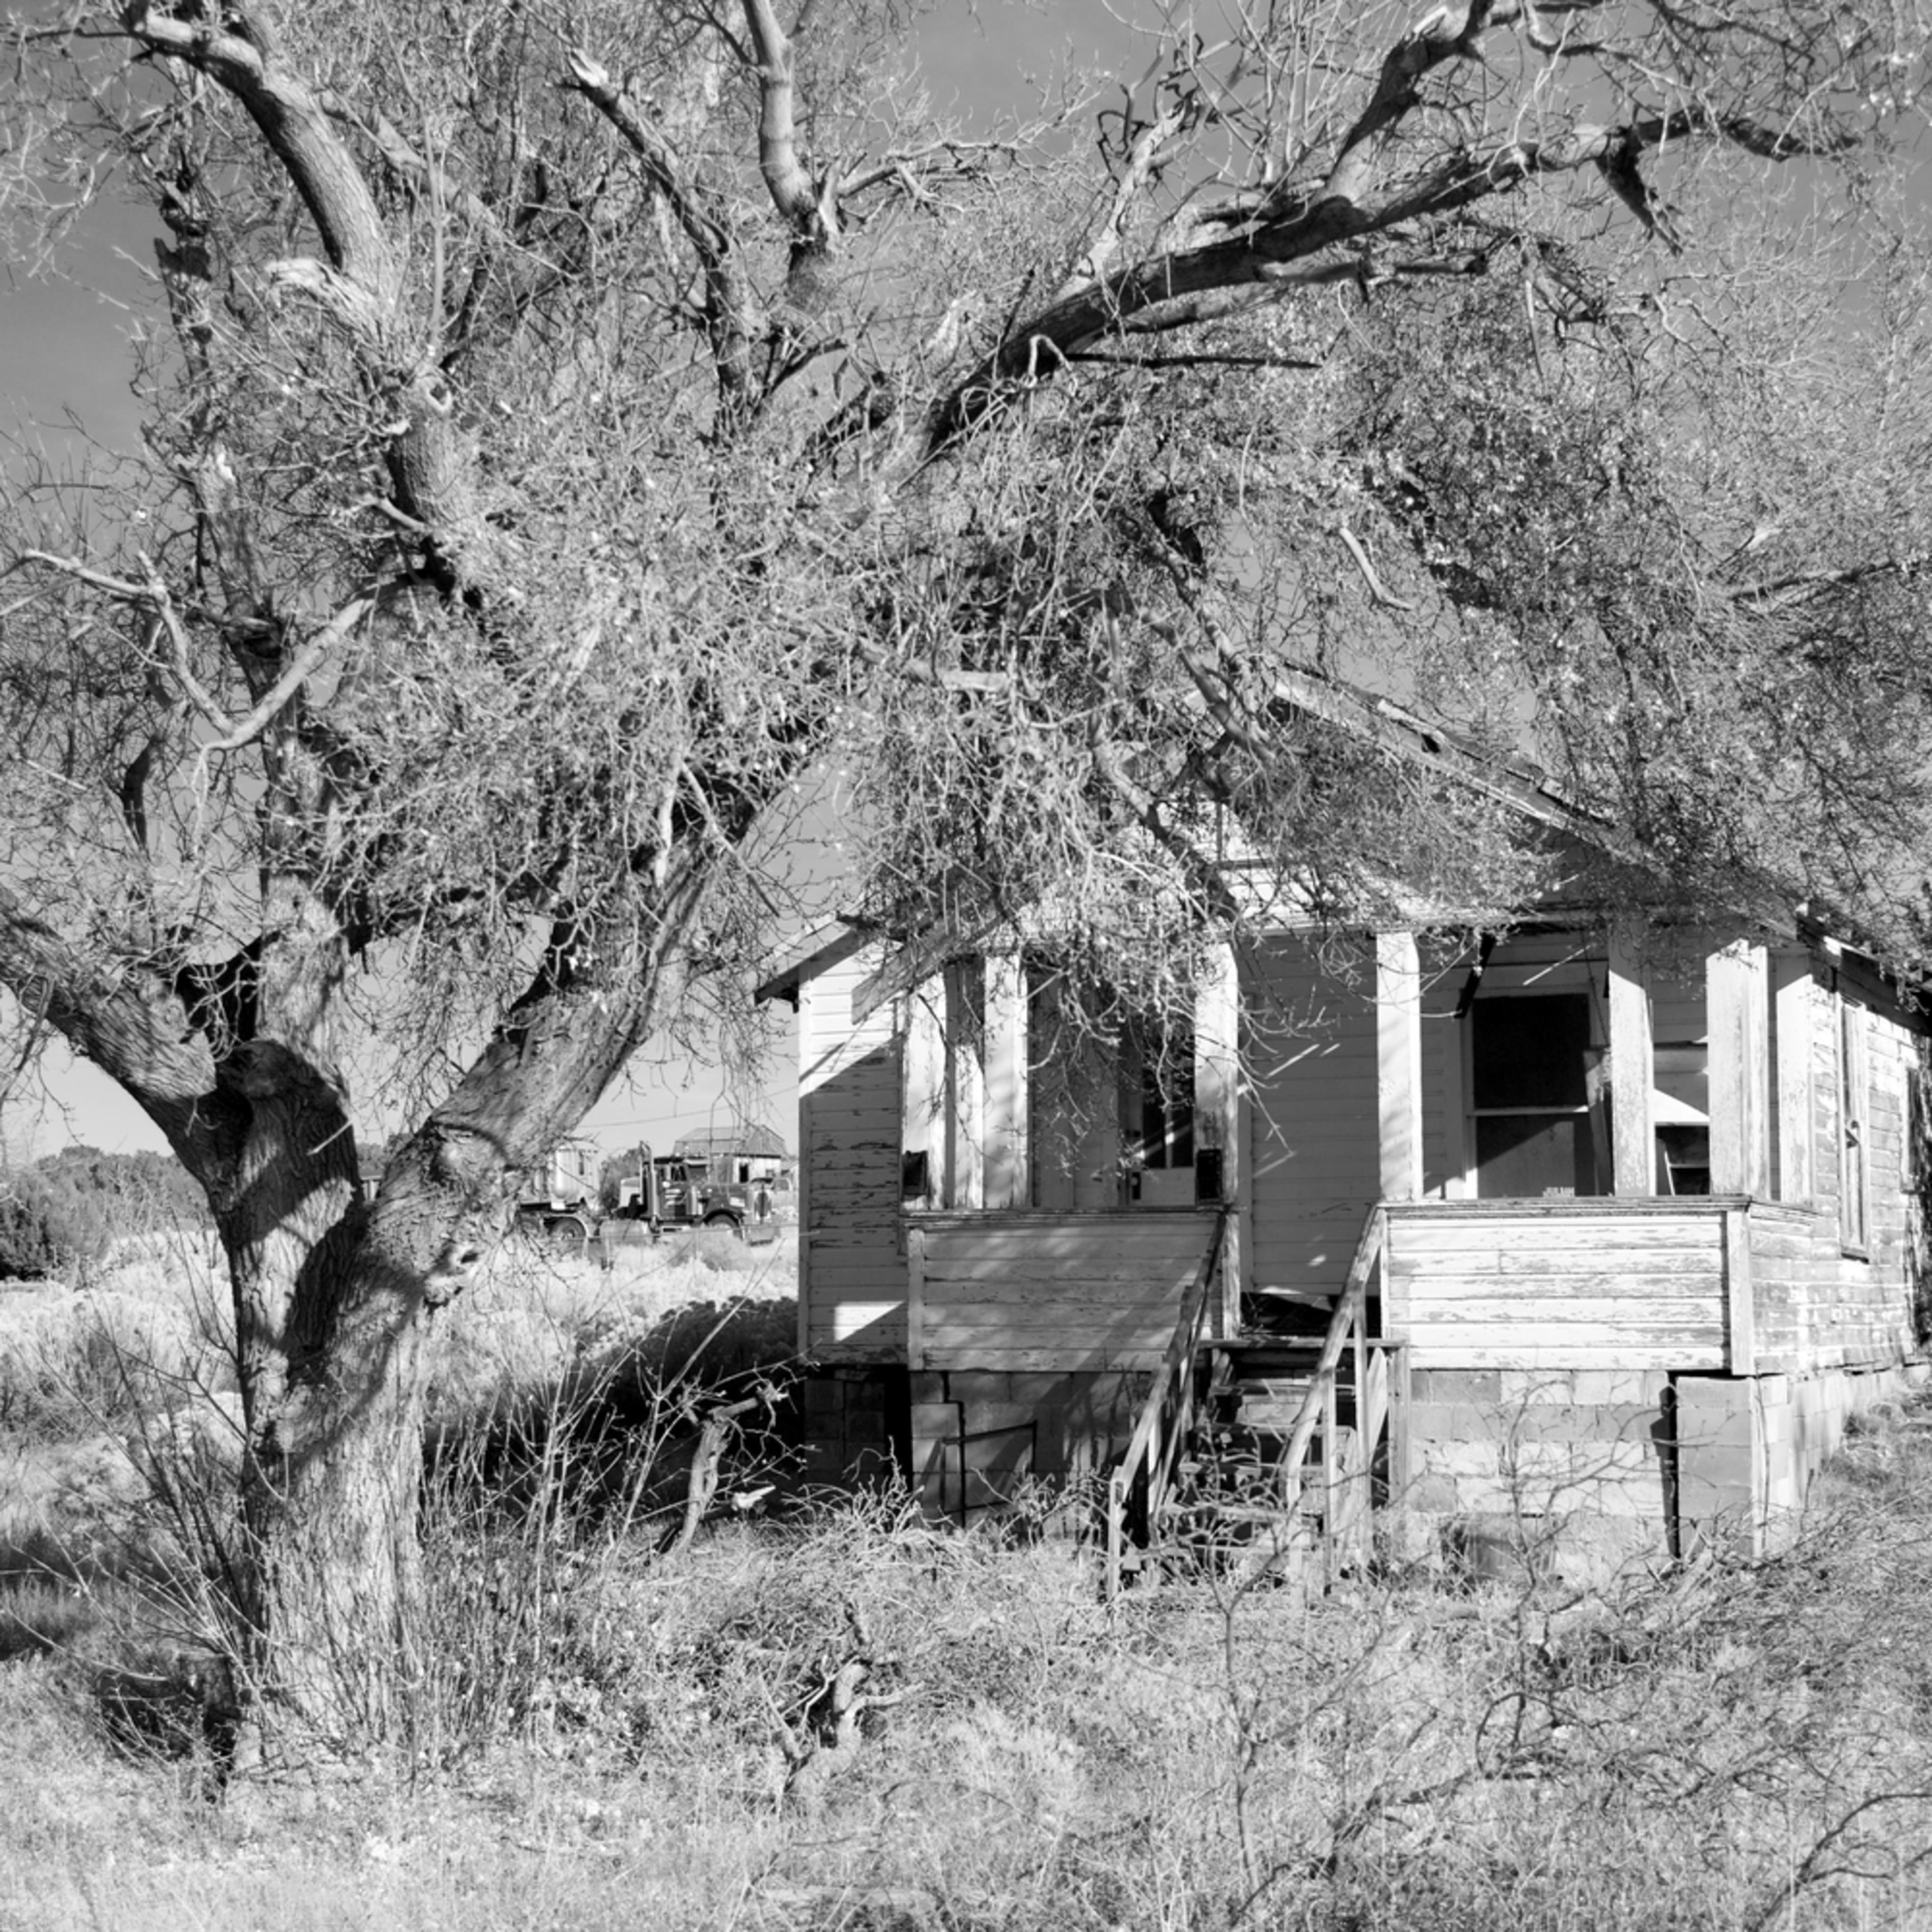 Abandoned home new madrid nm x6fv2k